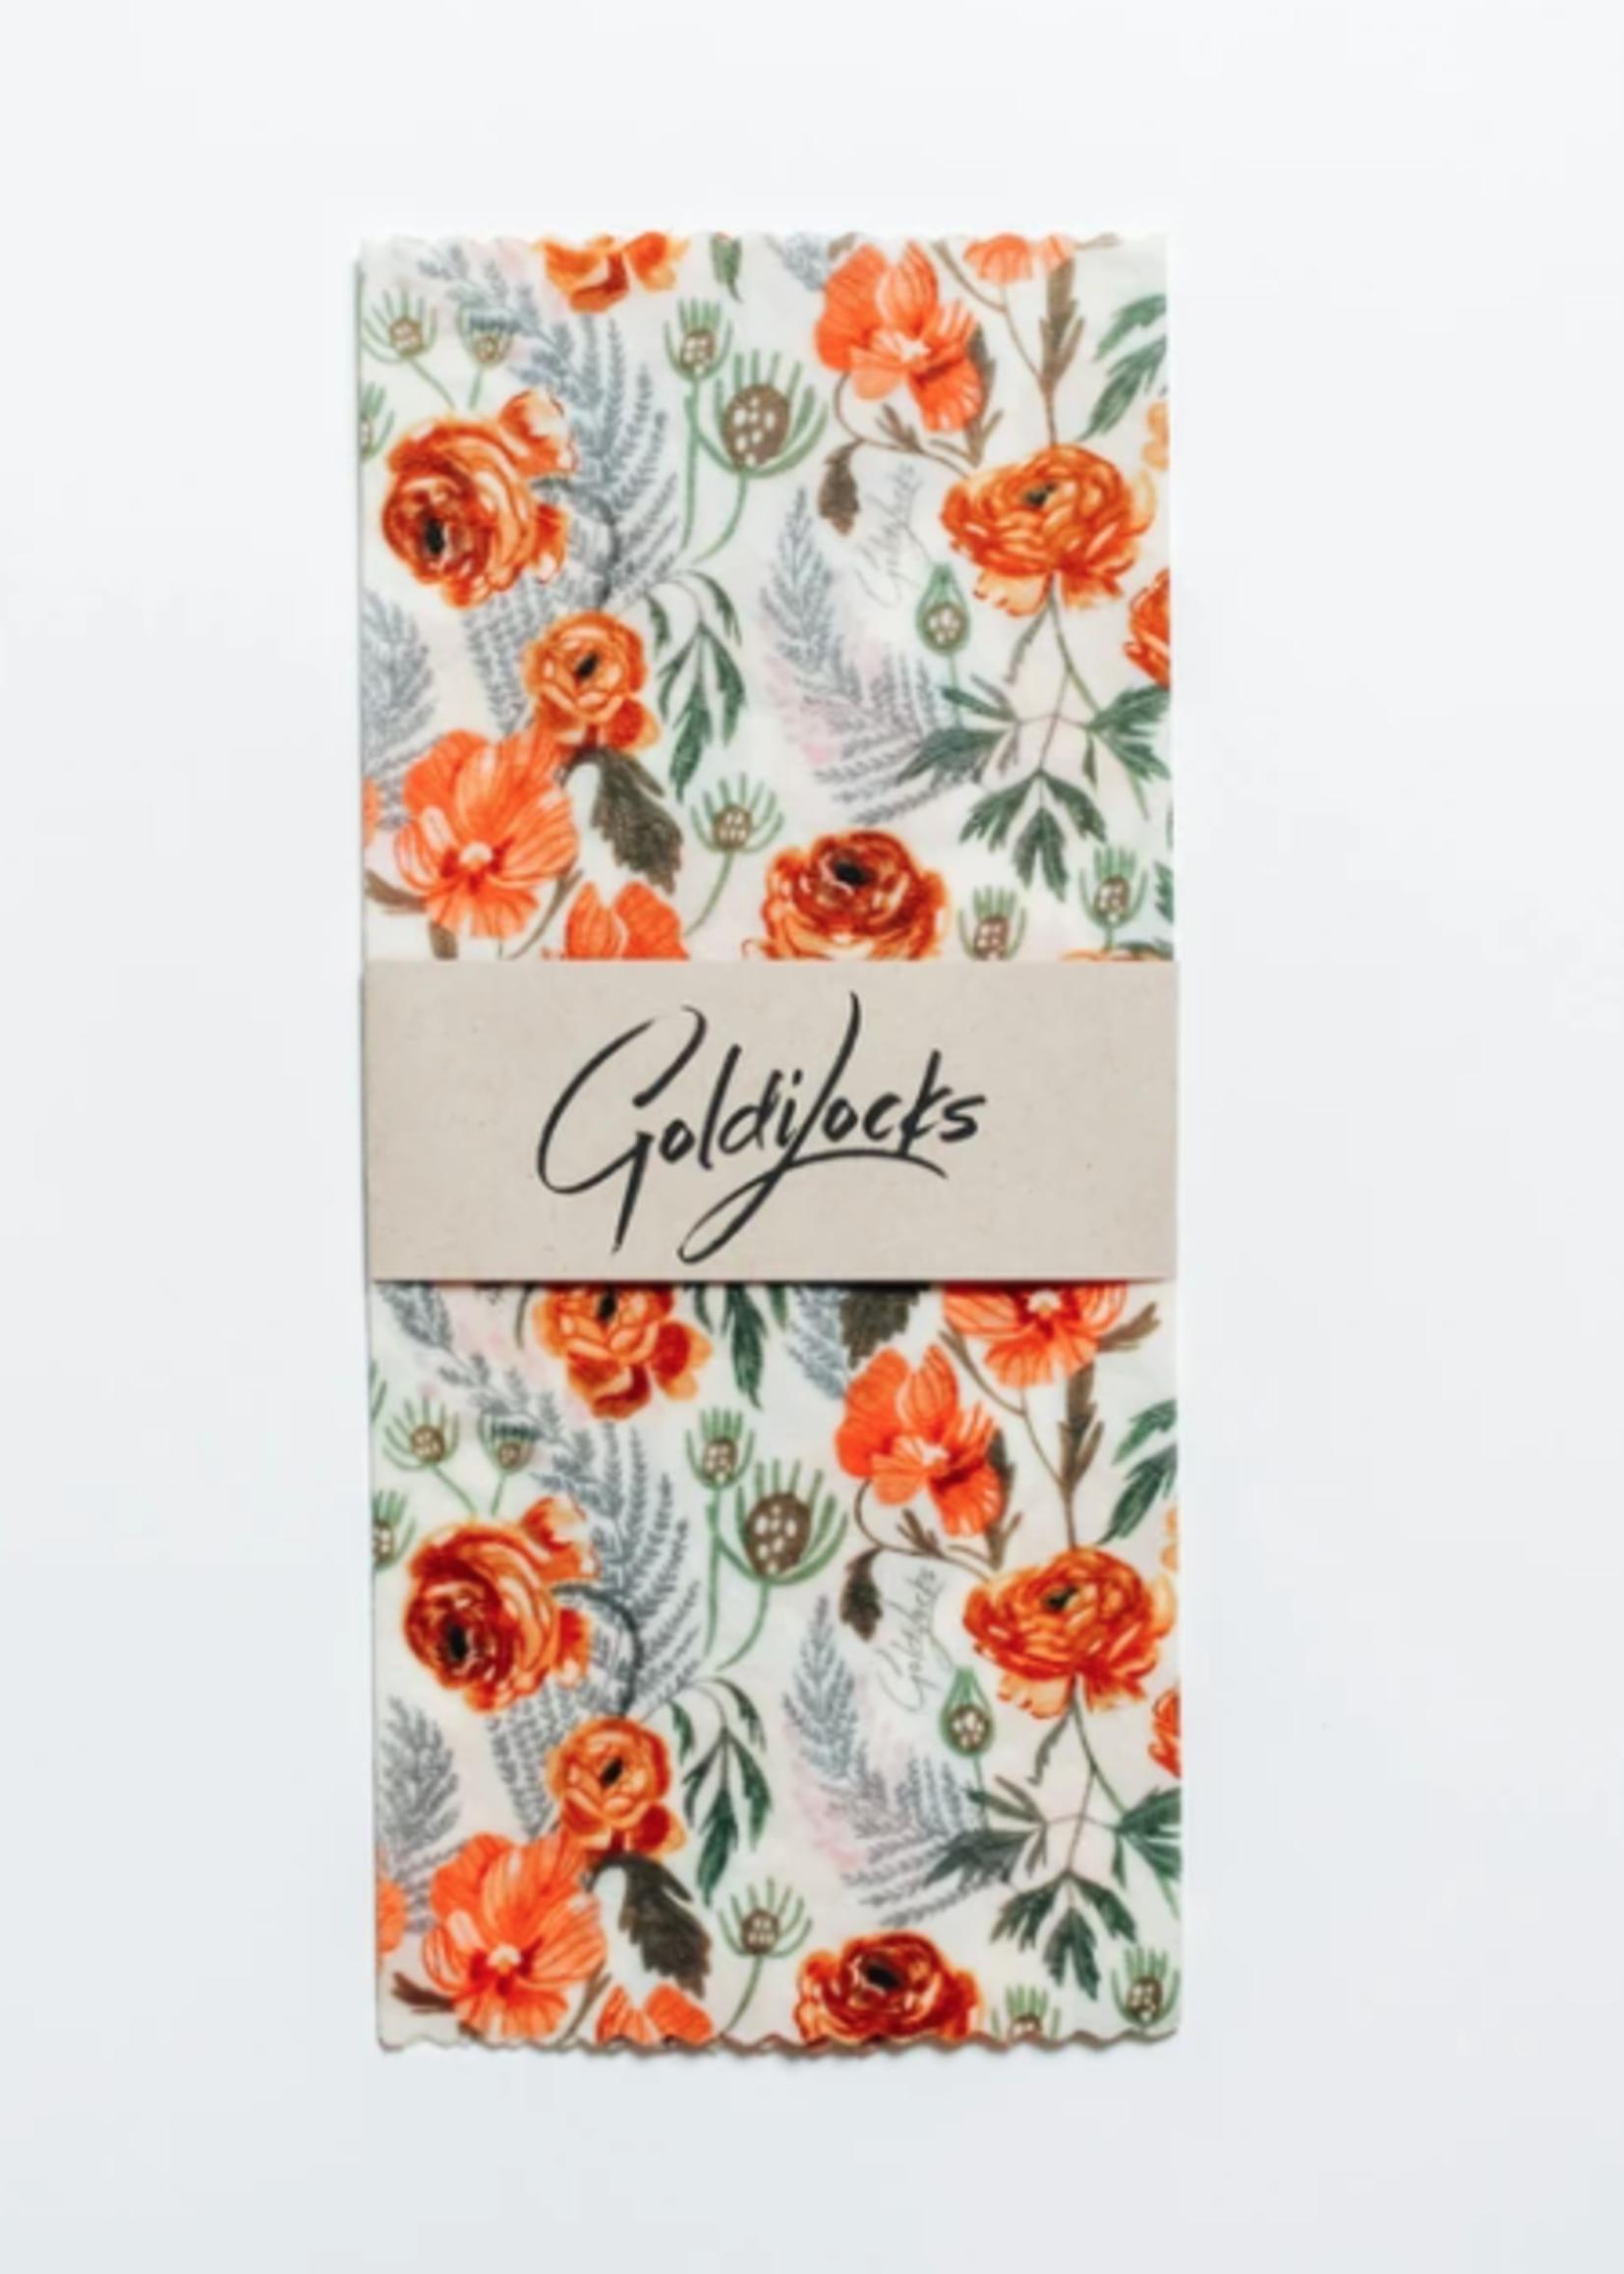 GOLDILOCKS wraps GOLDEN FLORAL Food Wraps, Medium